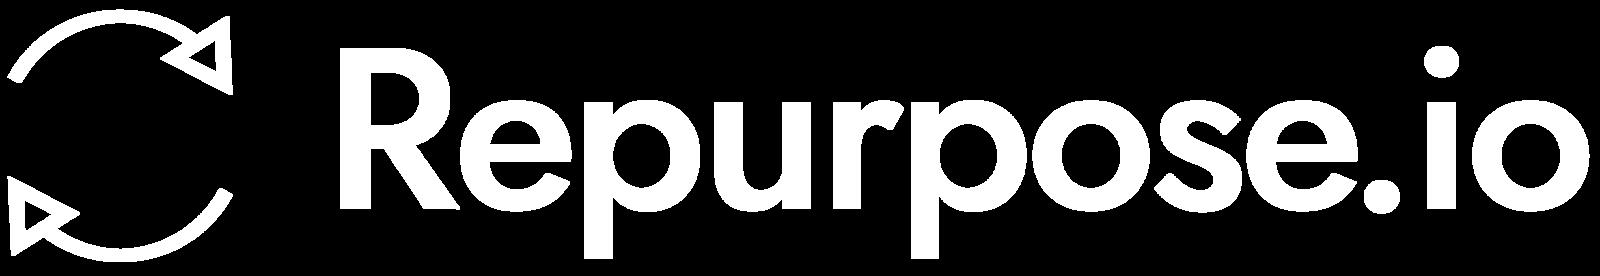 Repurpose.io Help Desk